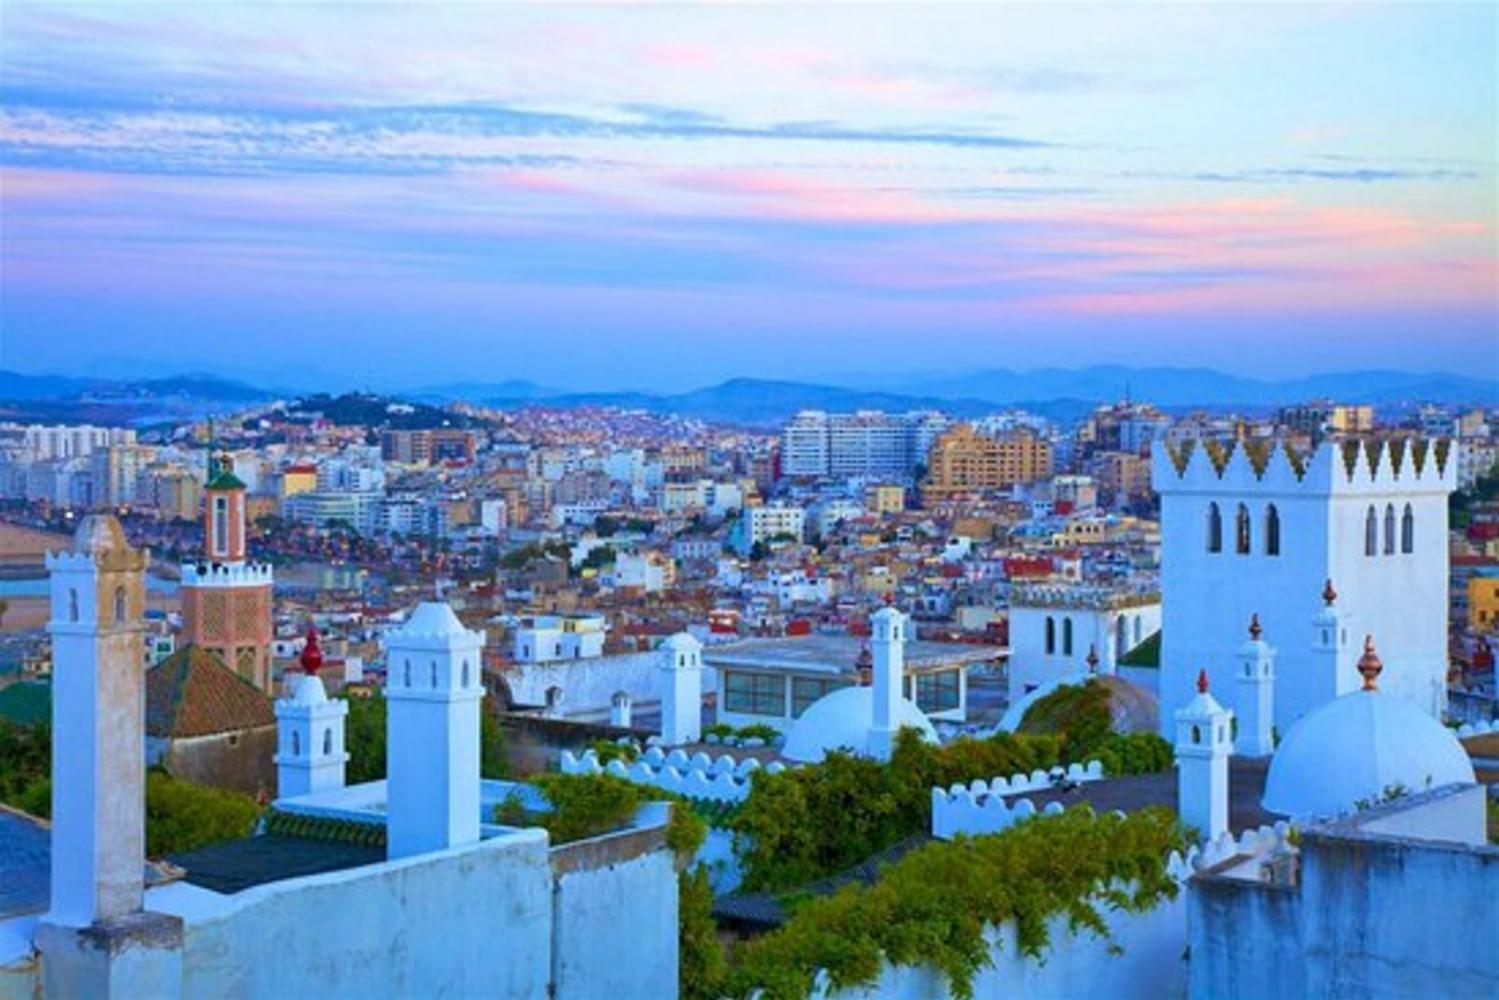 Tangier Kasbah, Morocco